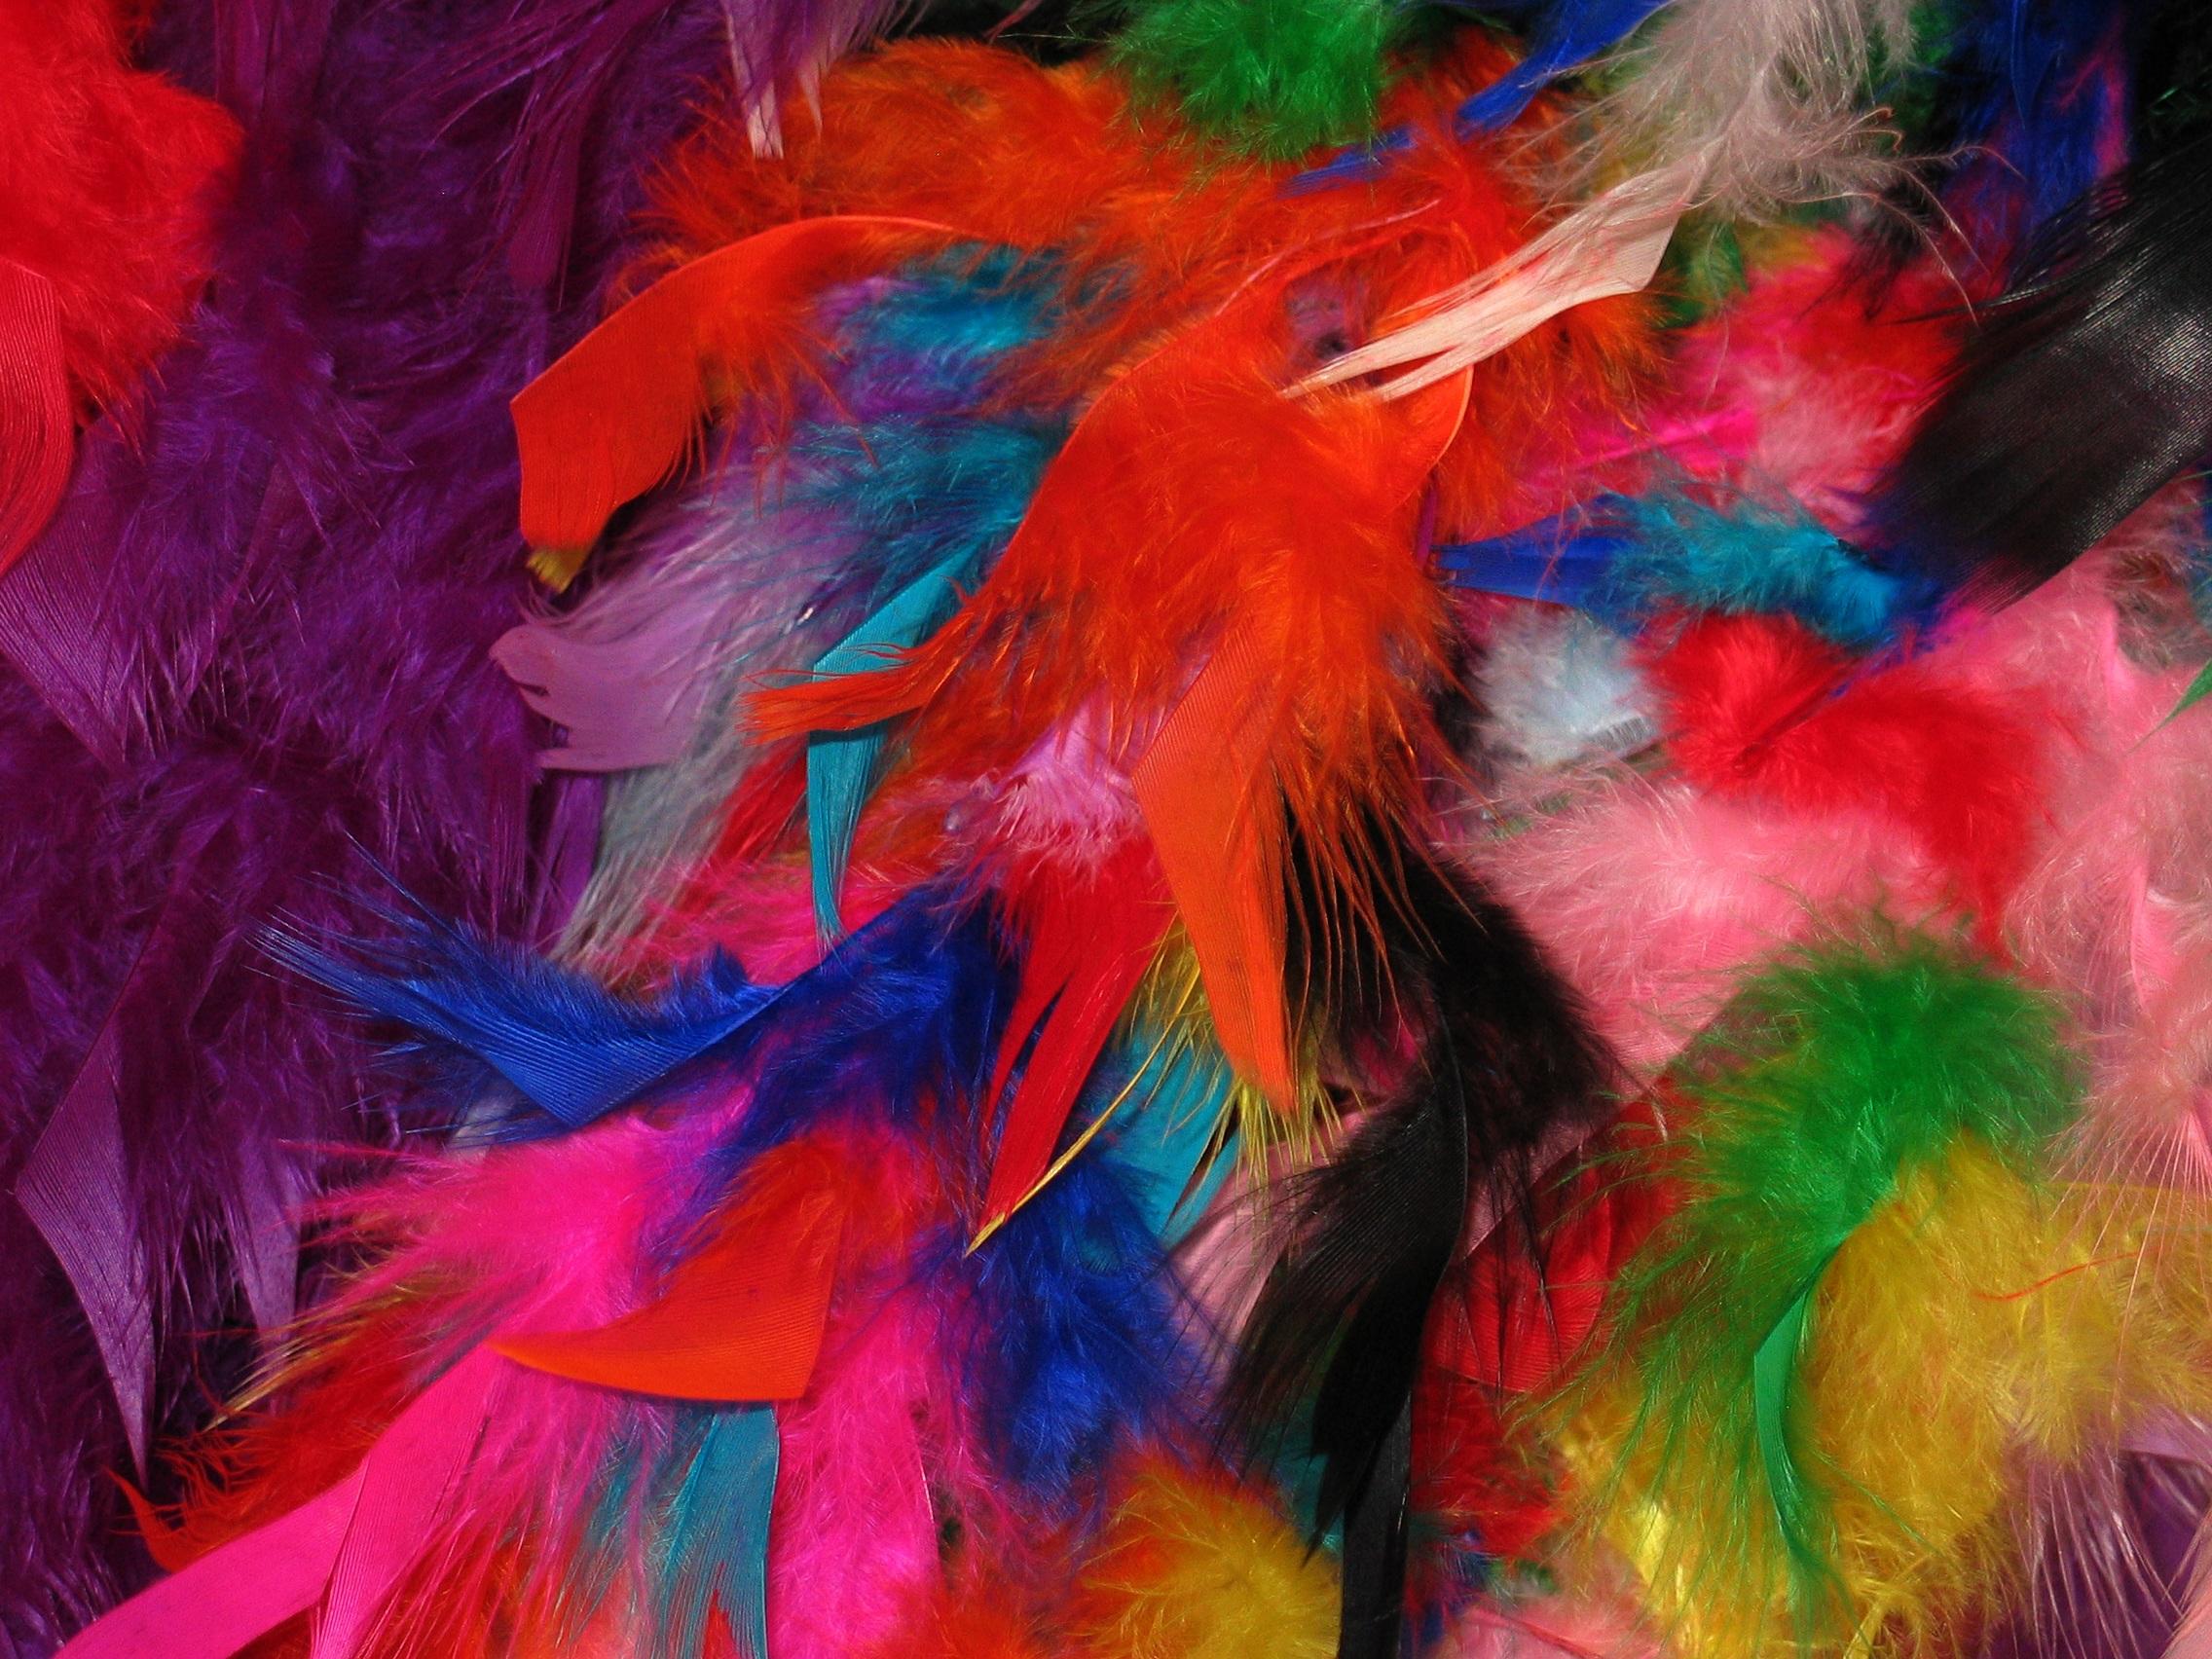 Kostenlose foto vogel liebe dekoration muster for Karneval dekoration